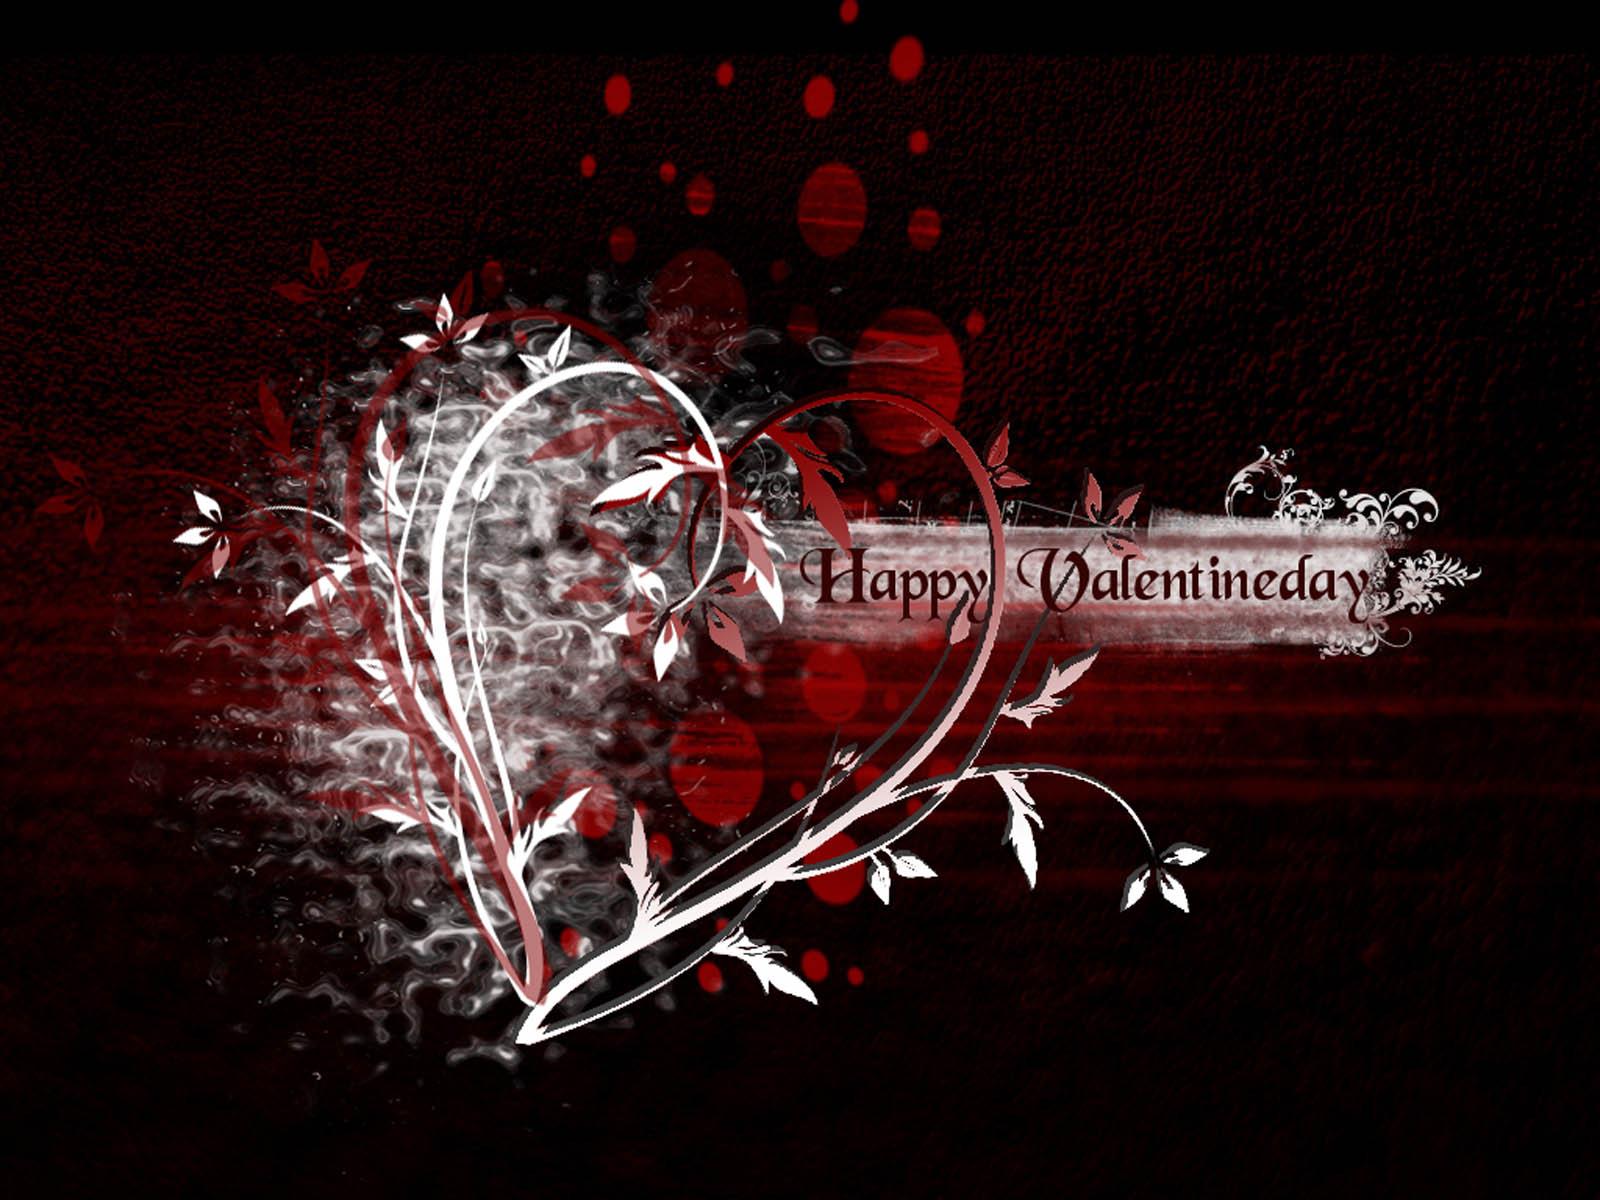 valentines day background wallpaper - photo #32